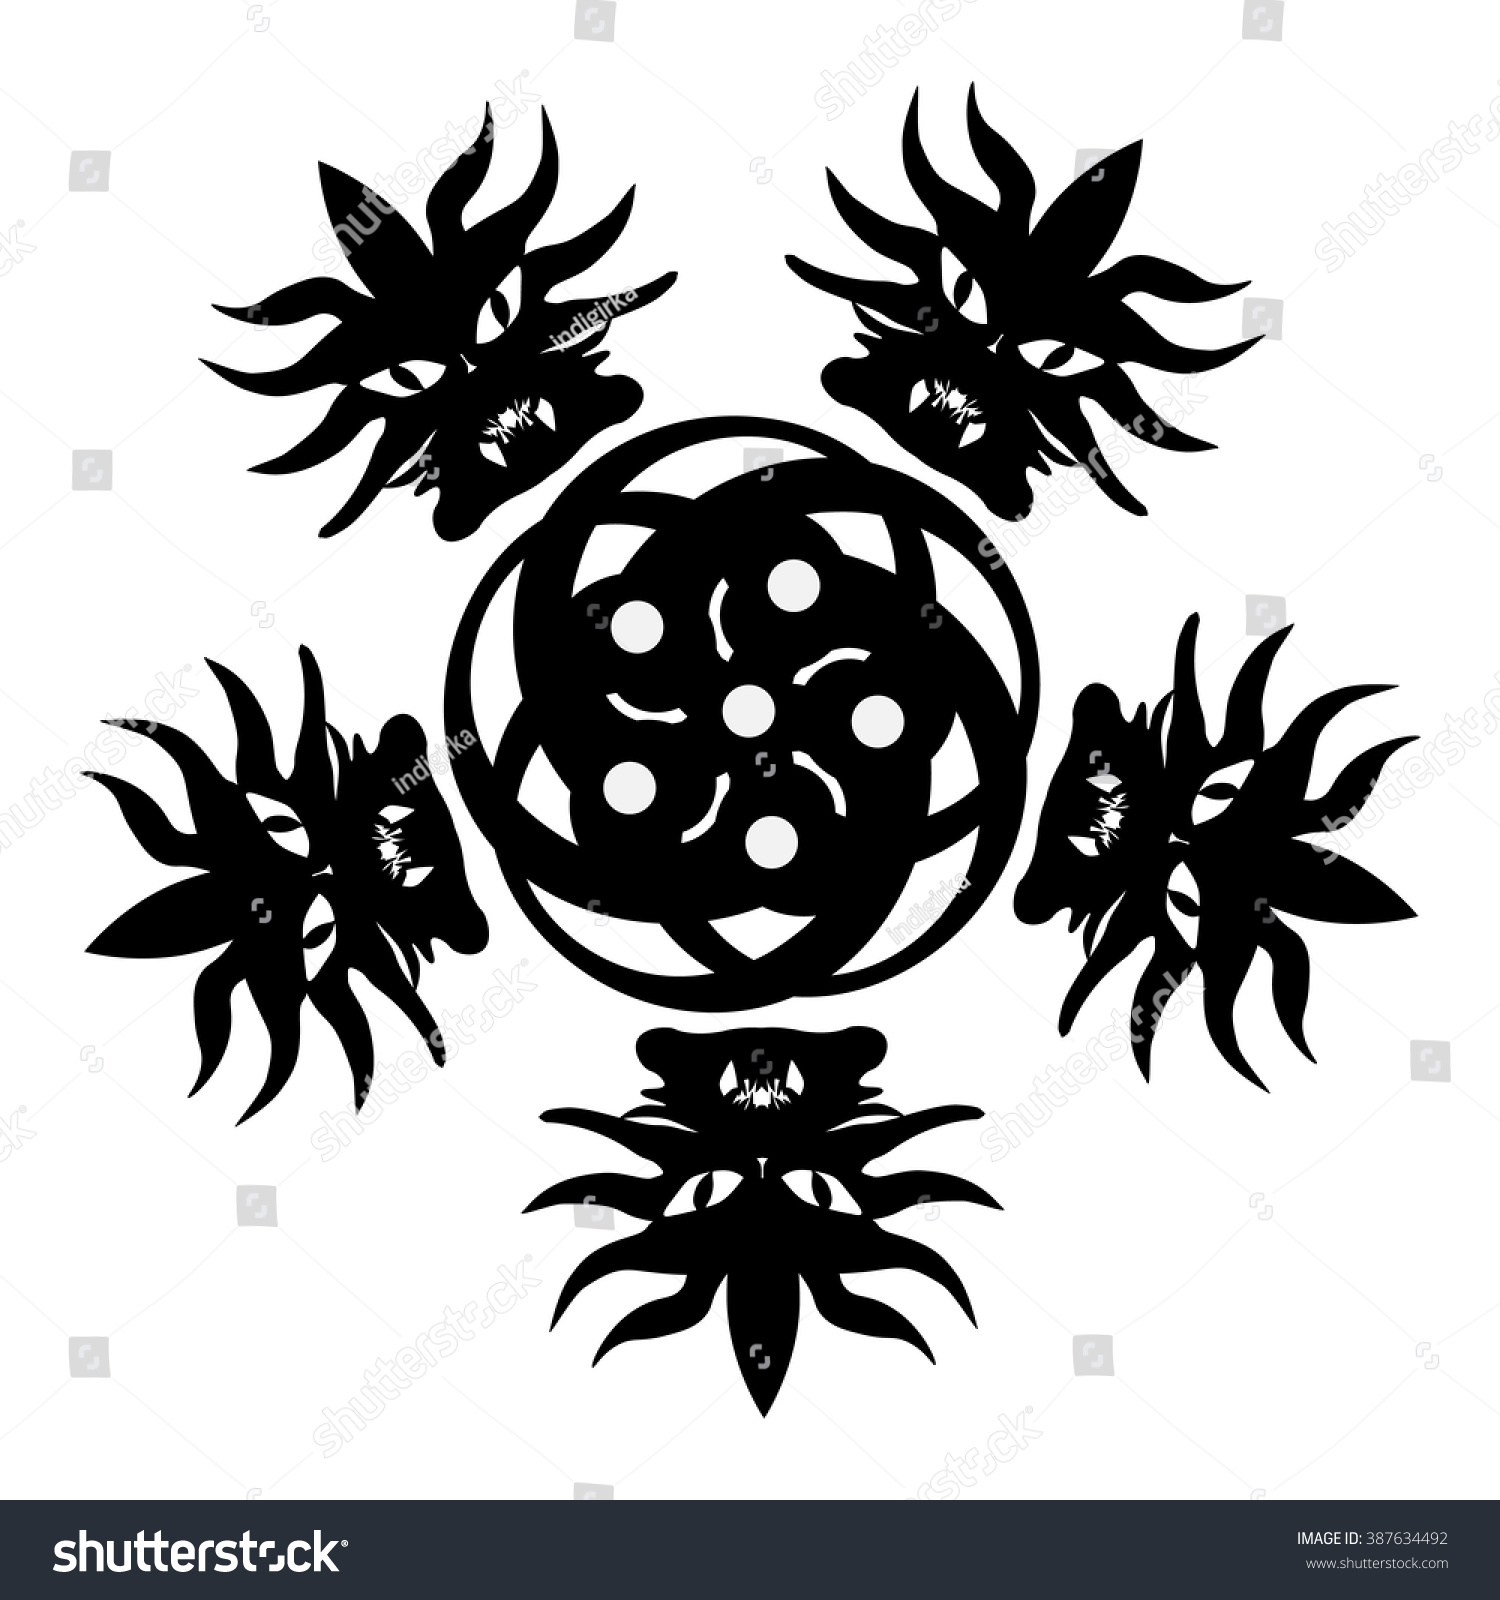 monster tribal tattootshirt design halloween icon stock vektor 387634492 shutterstock. Black Bedroom Furniture Sets. Home Design Ideas